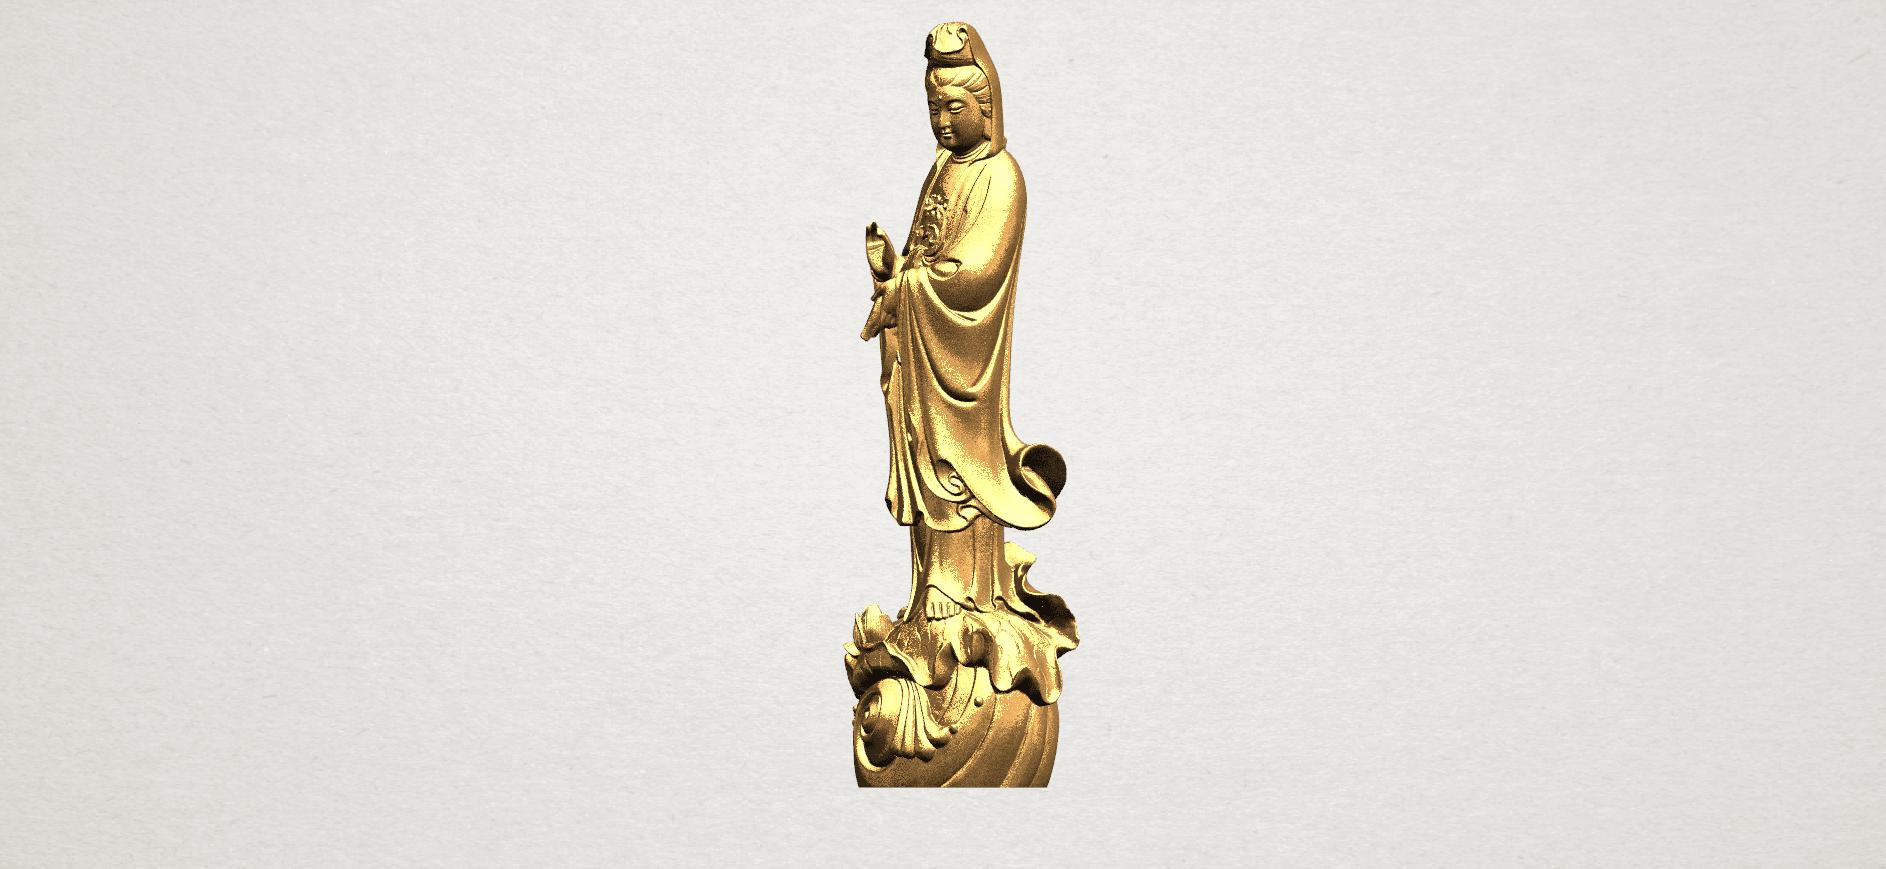 Avalokitesvara Buddha - Standing (i) A02.png Download free STL file Avalokitesvara Bodhisattva - Standing 01 • 3D printable design, GeorgesNikkei